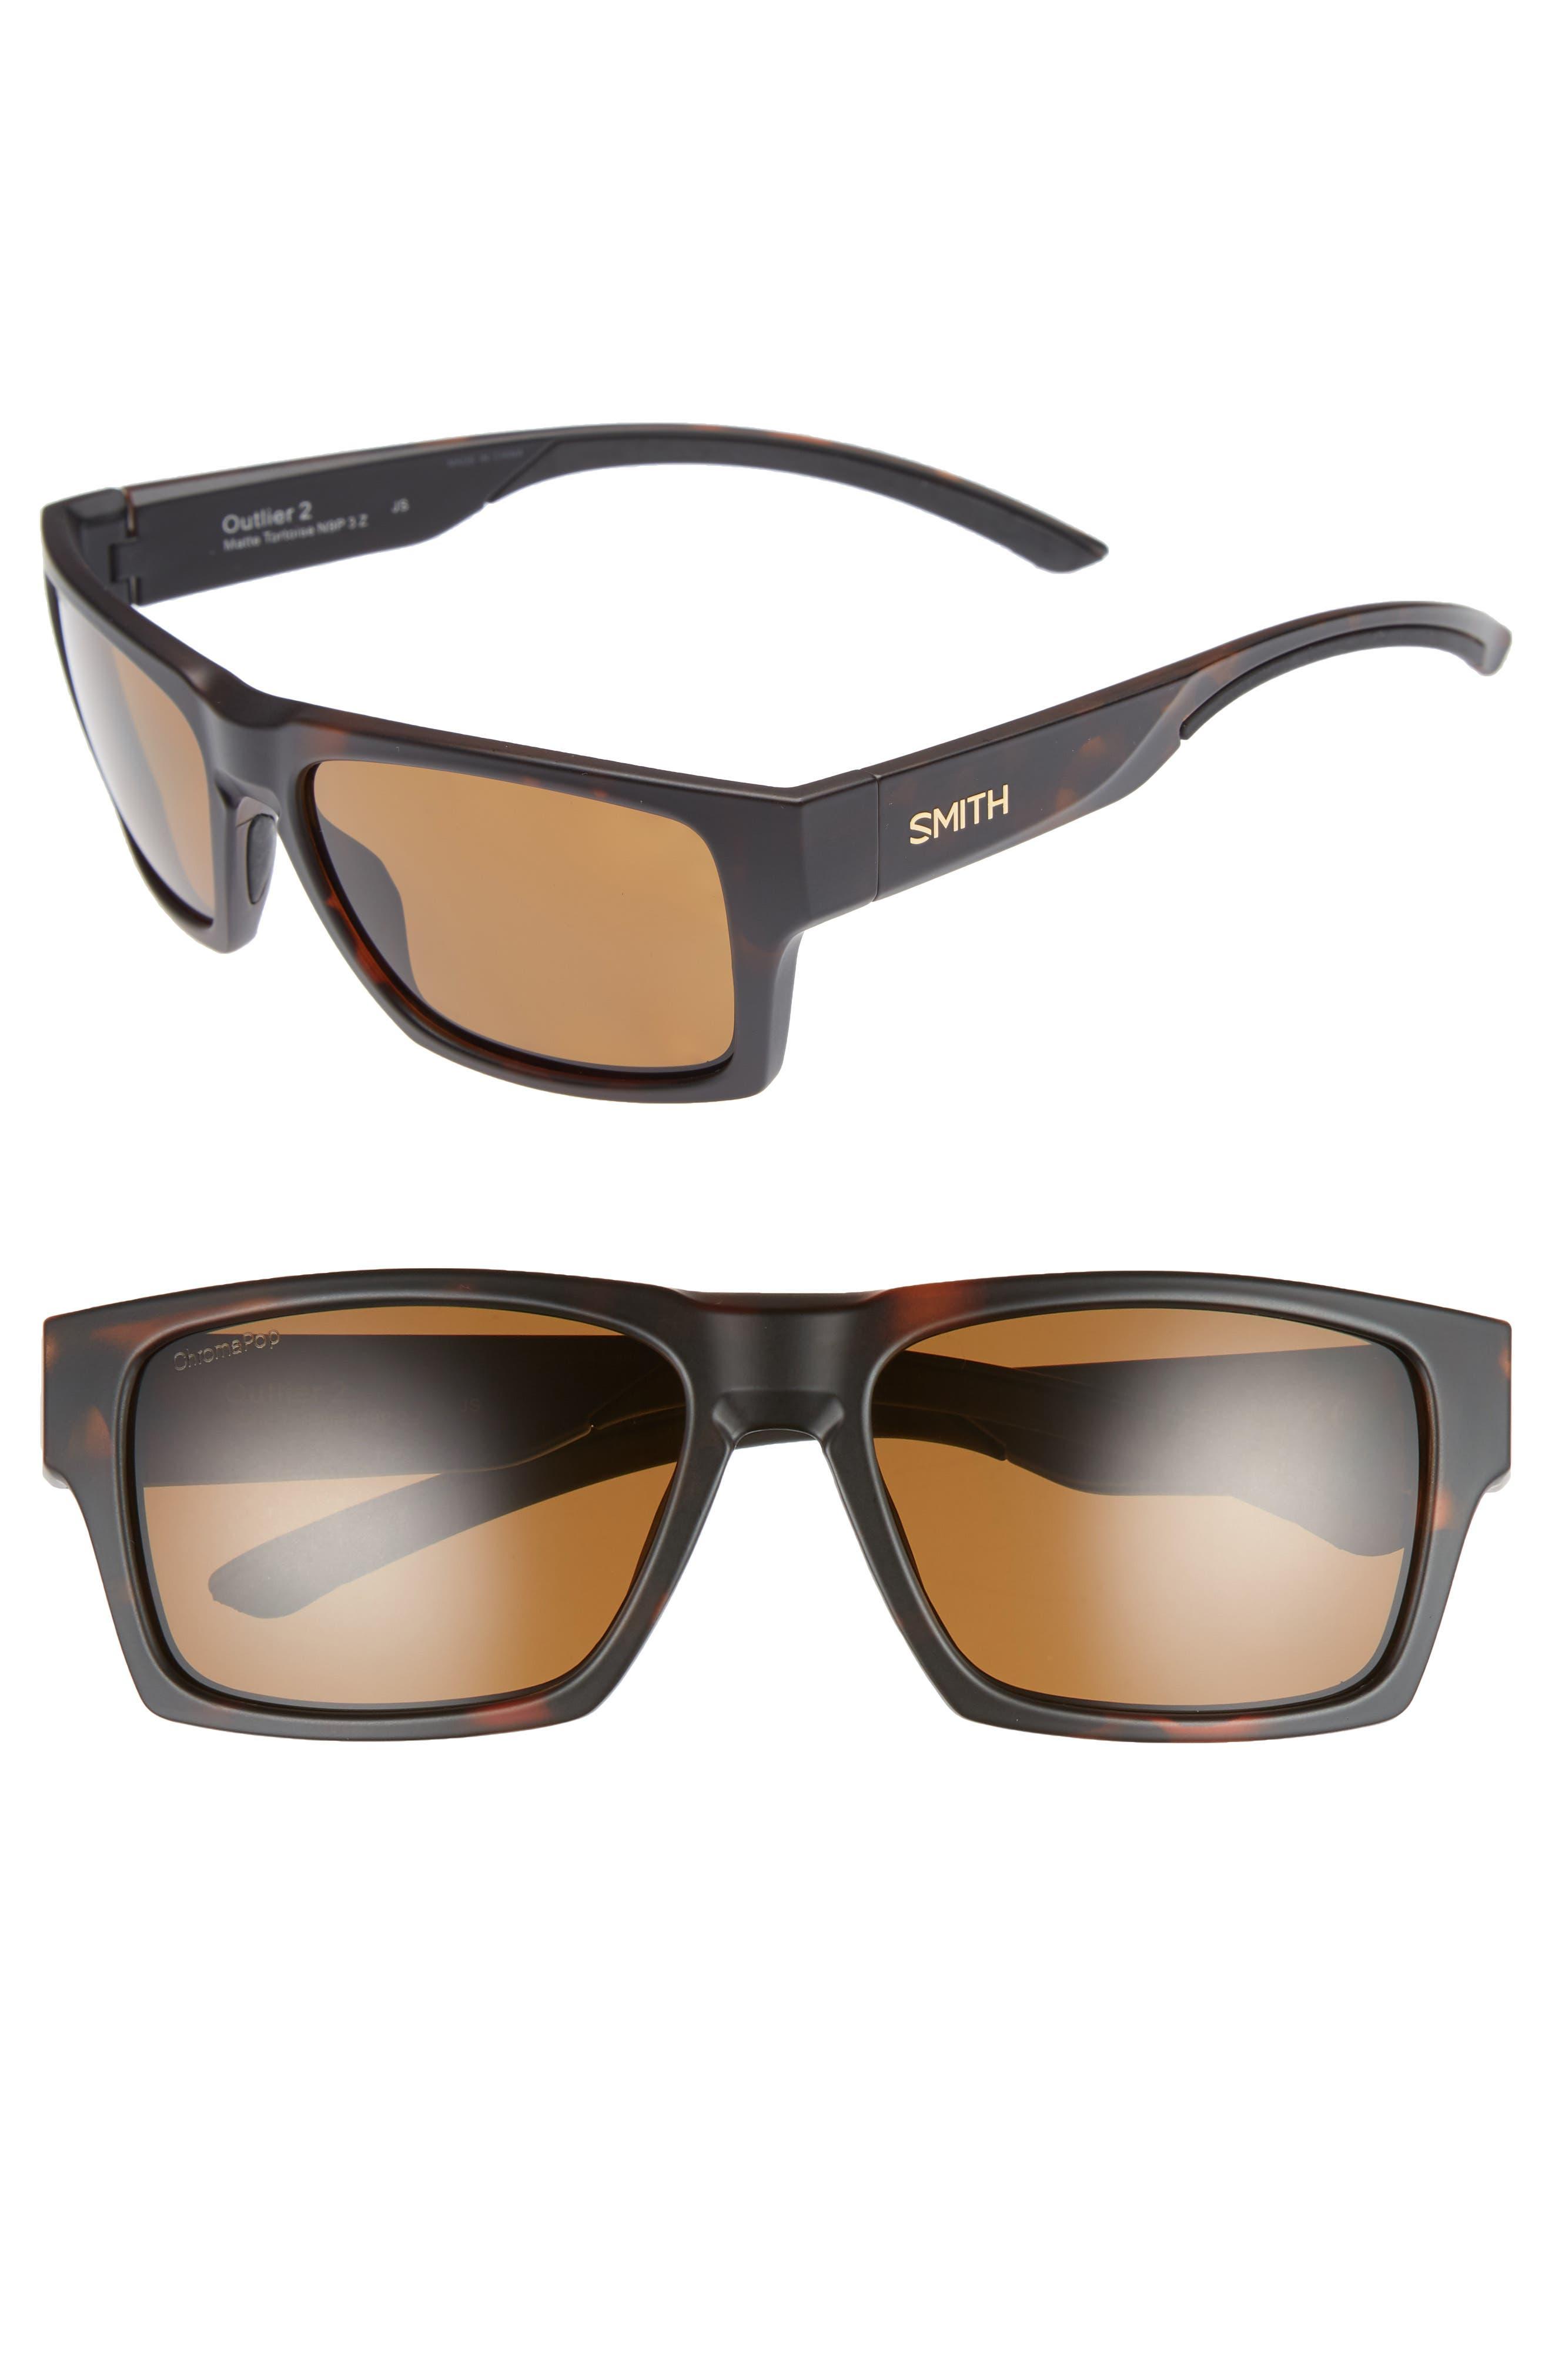 Smith Outlier 2 XL 59mm ChromaPop™ Polarized Sunglasses